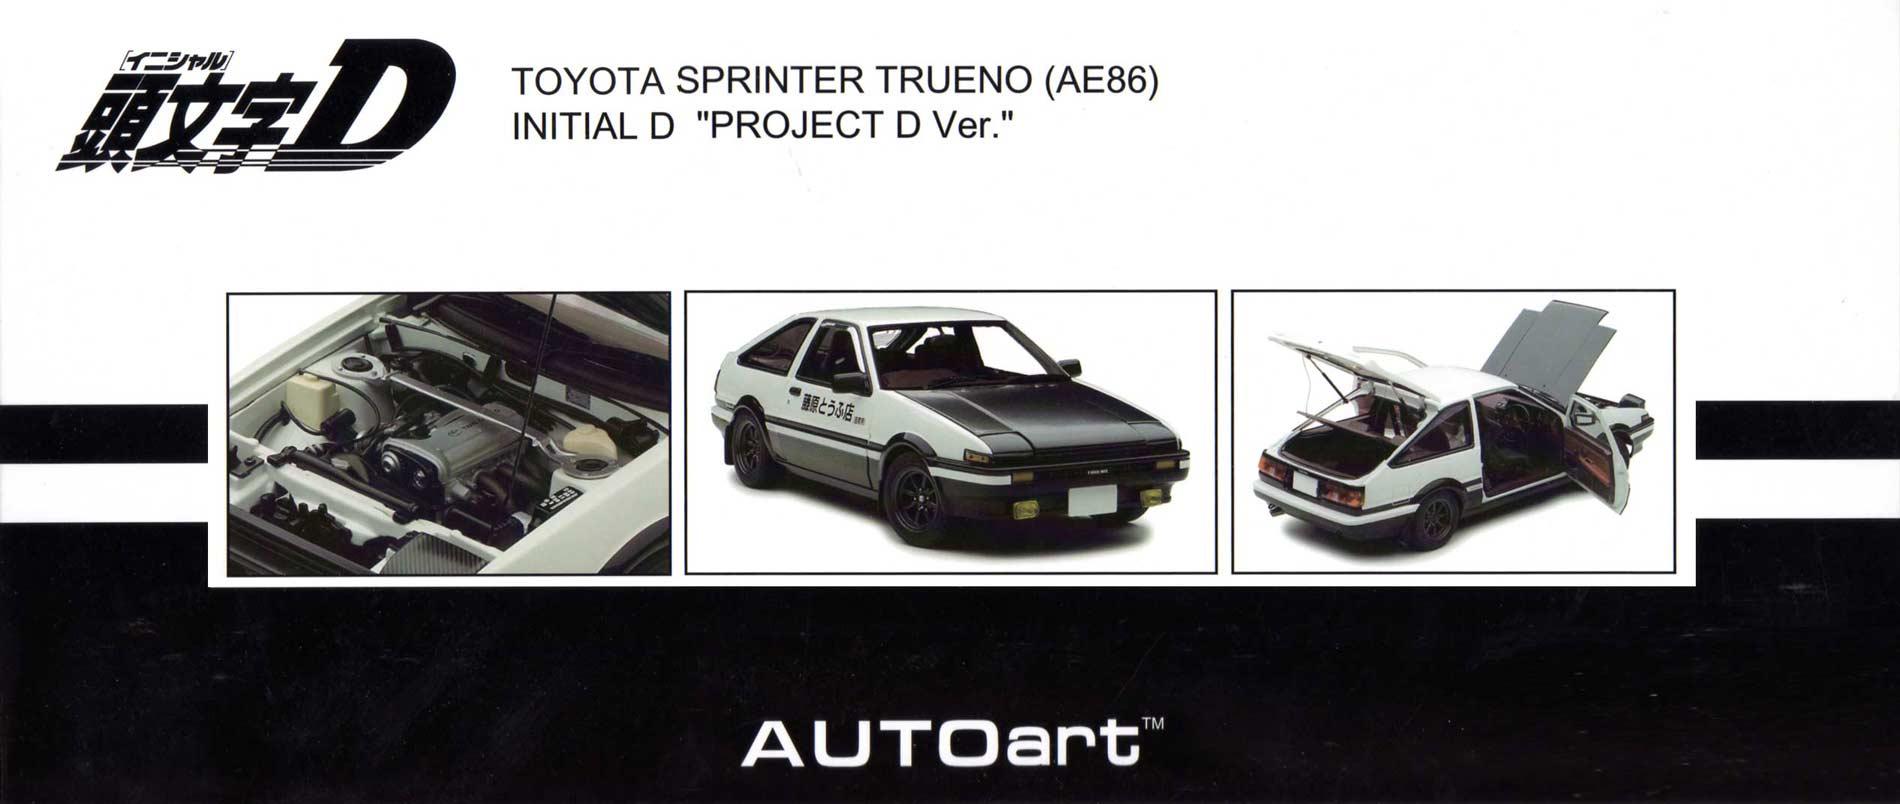 packaging face de la Toyota AE 86 - AUTOart - Initial D - packaging face